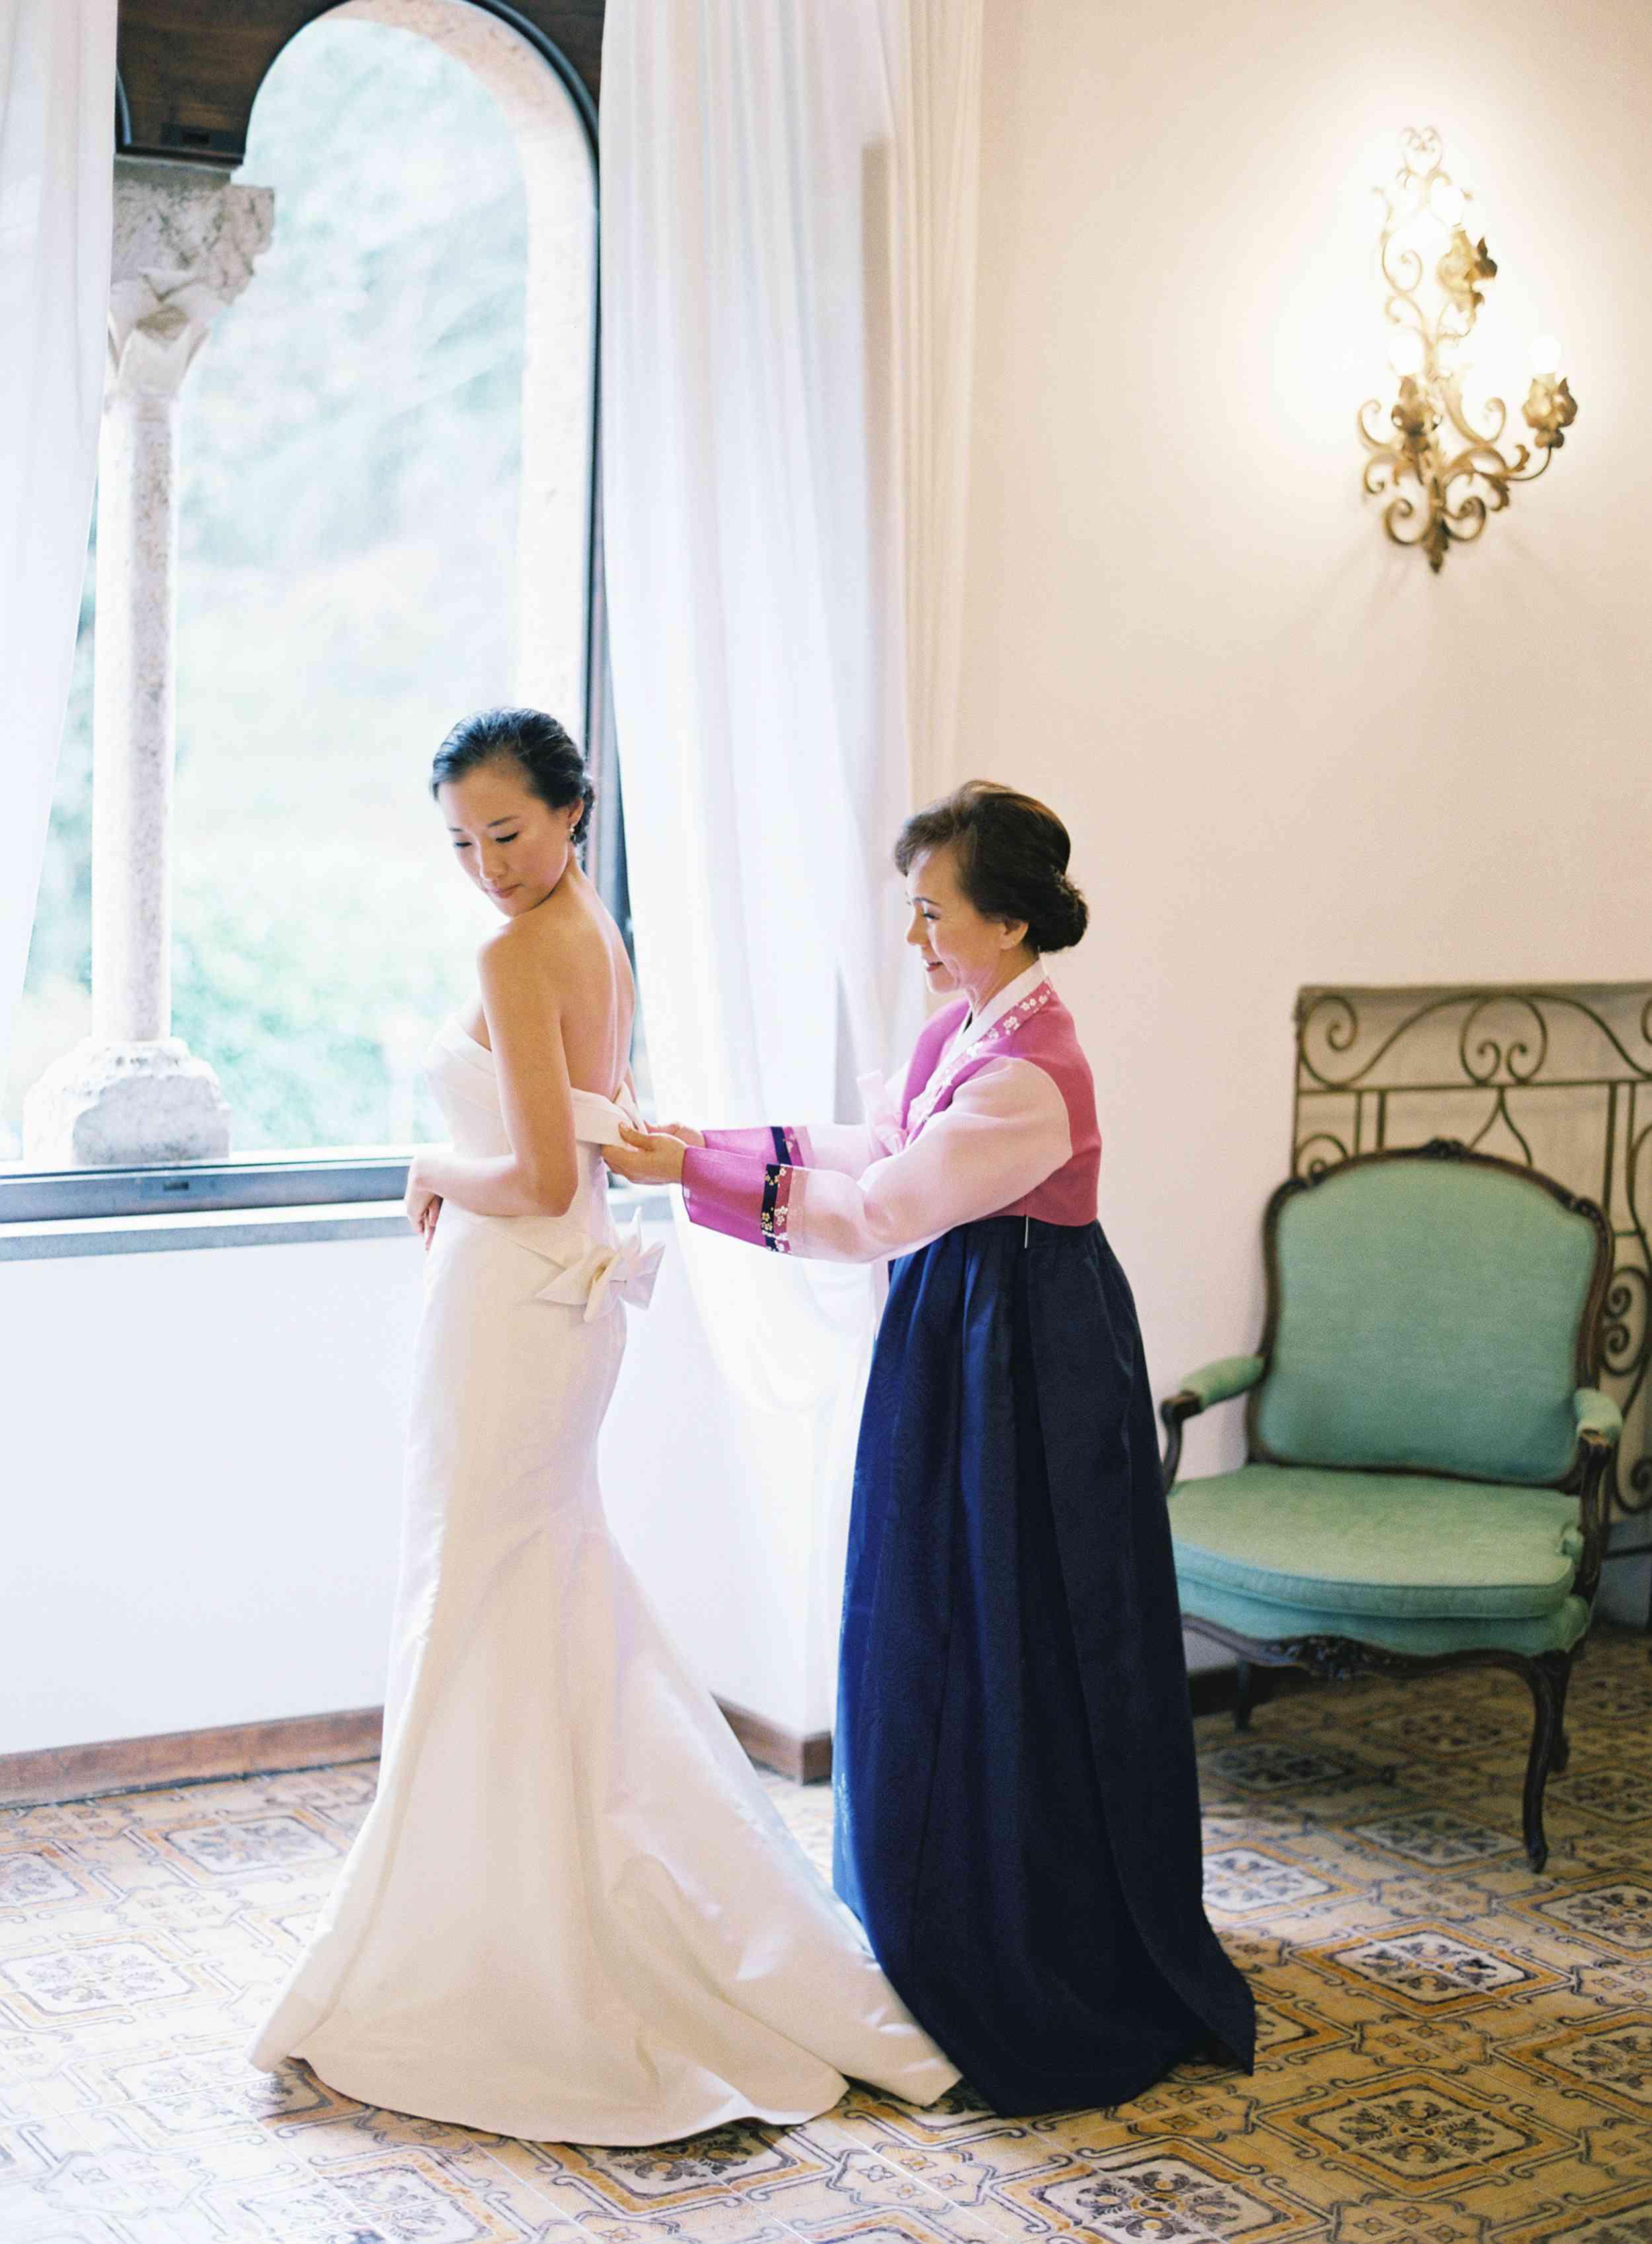 classic la badia italian wedding, mother helping bride wedding dress